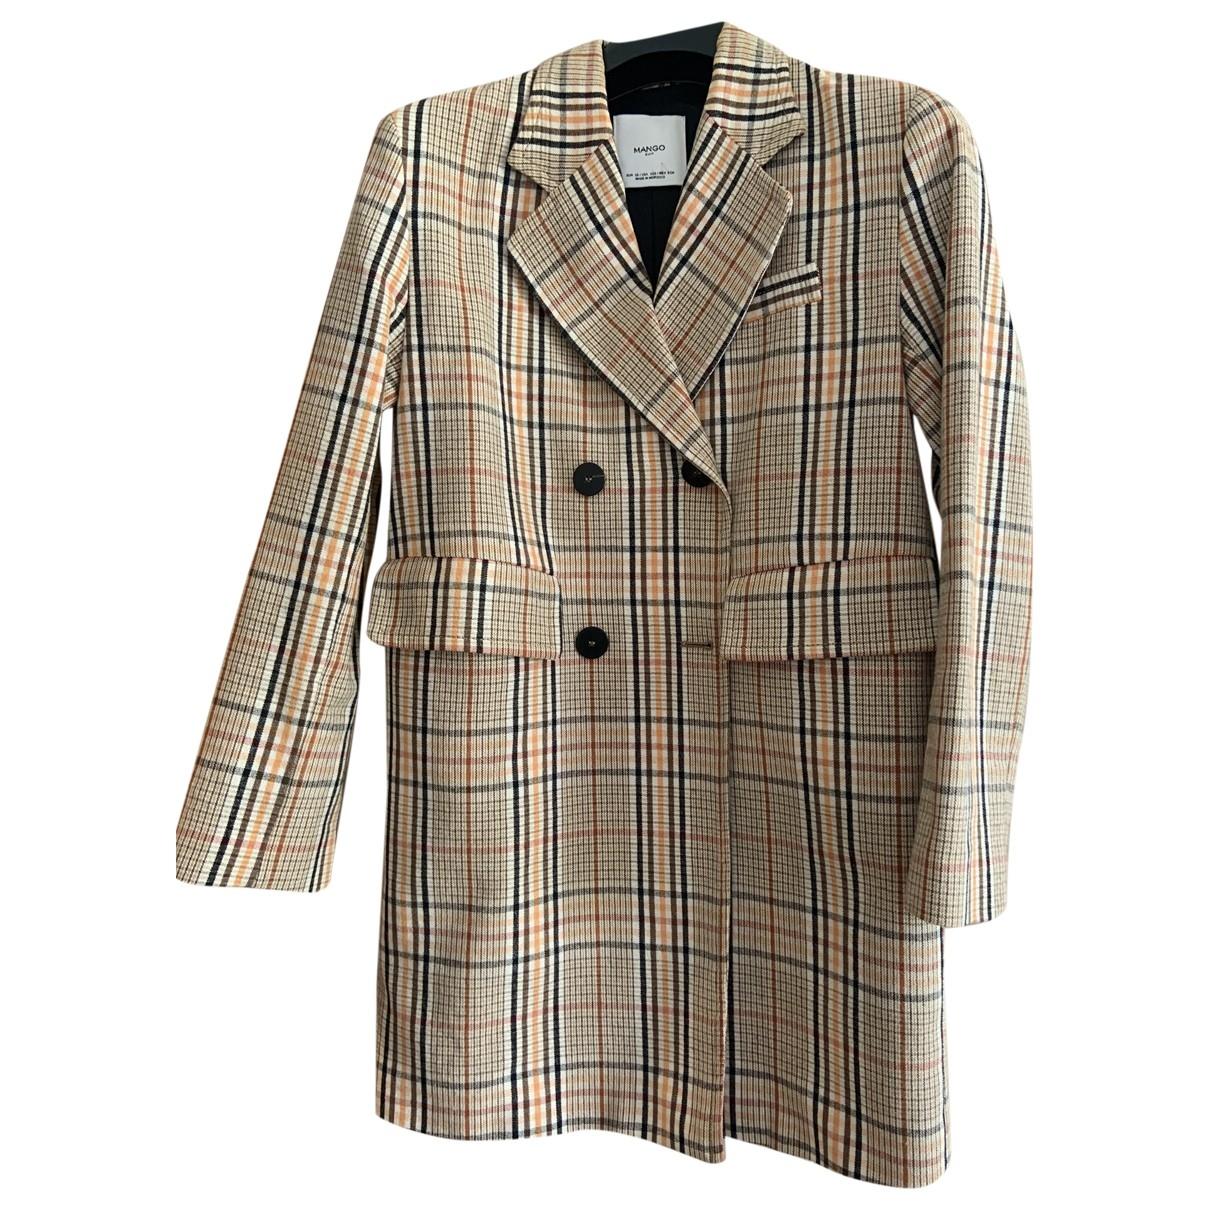 Mango \N Beige Cotton coat for Women XS International